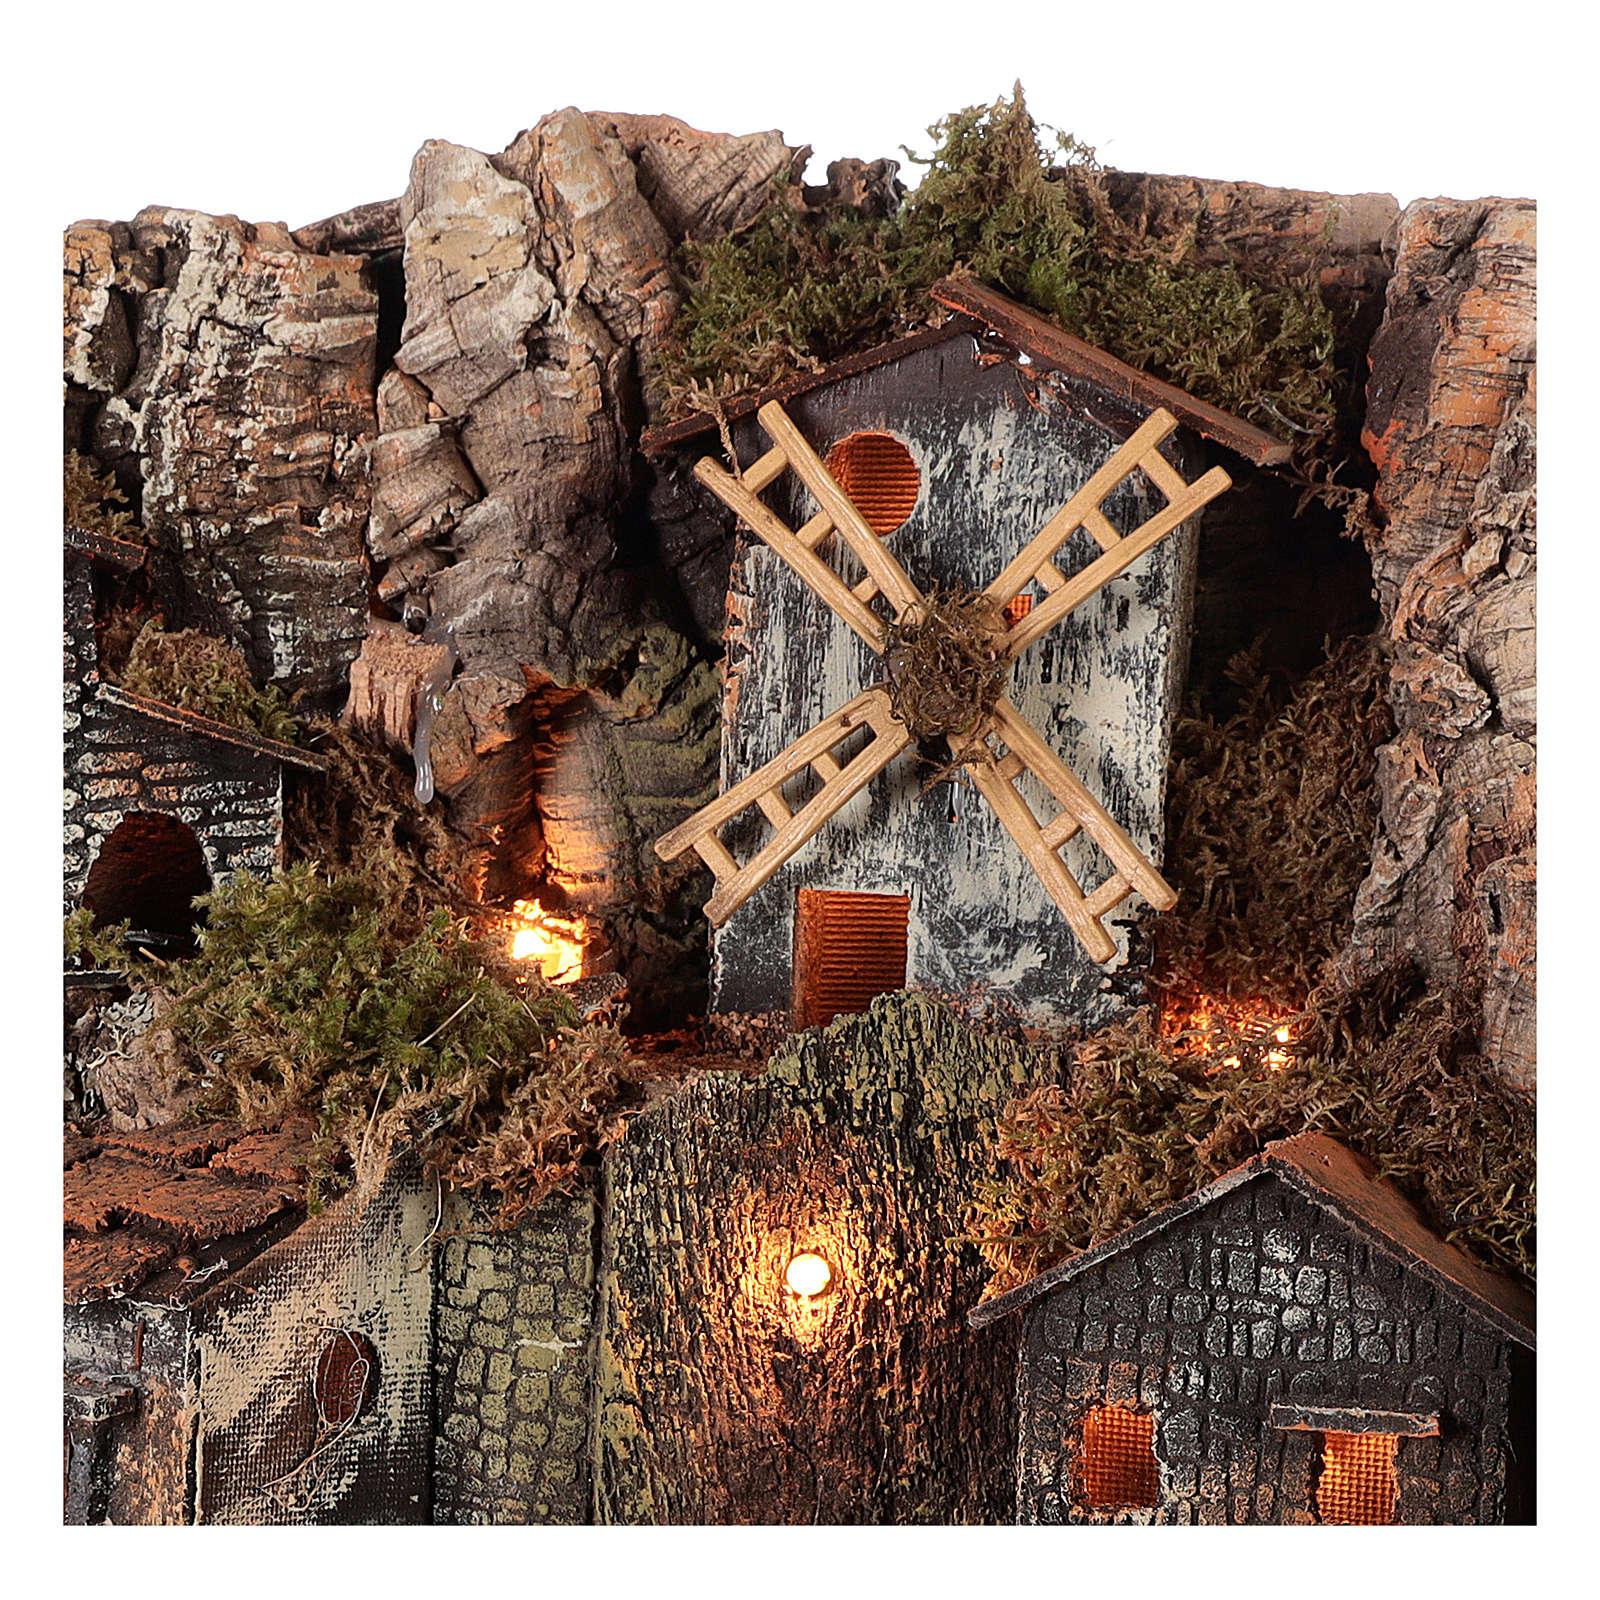 Rustic village setting for 12-16 cm Neapolitan Nativity scene 4